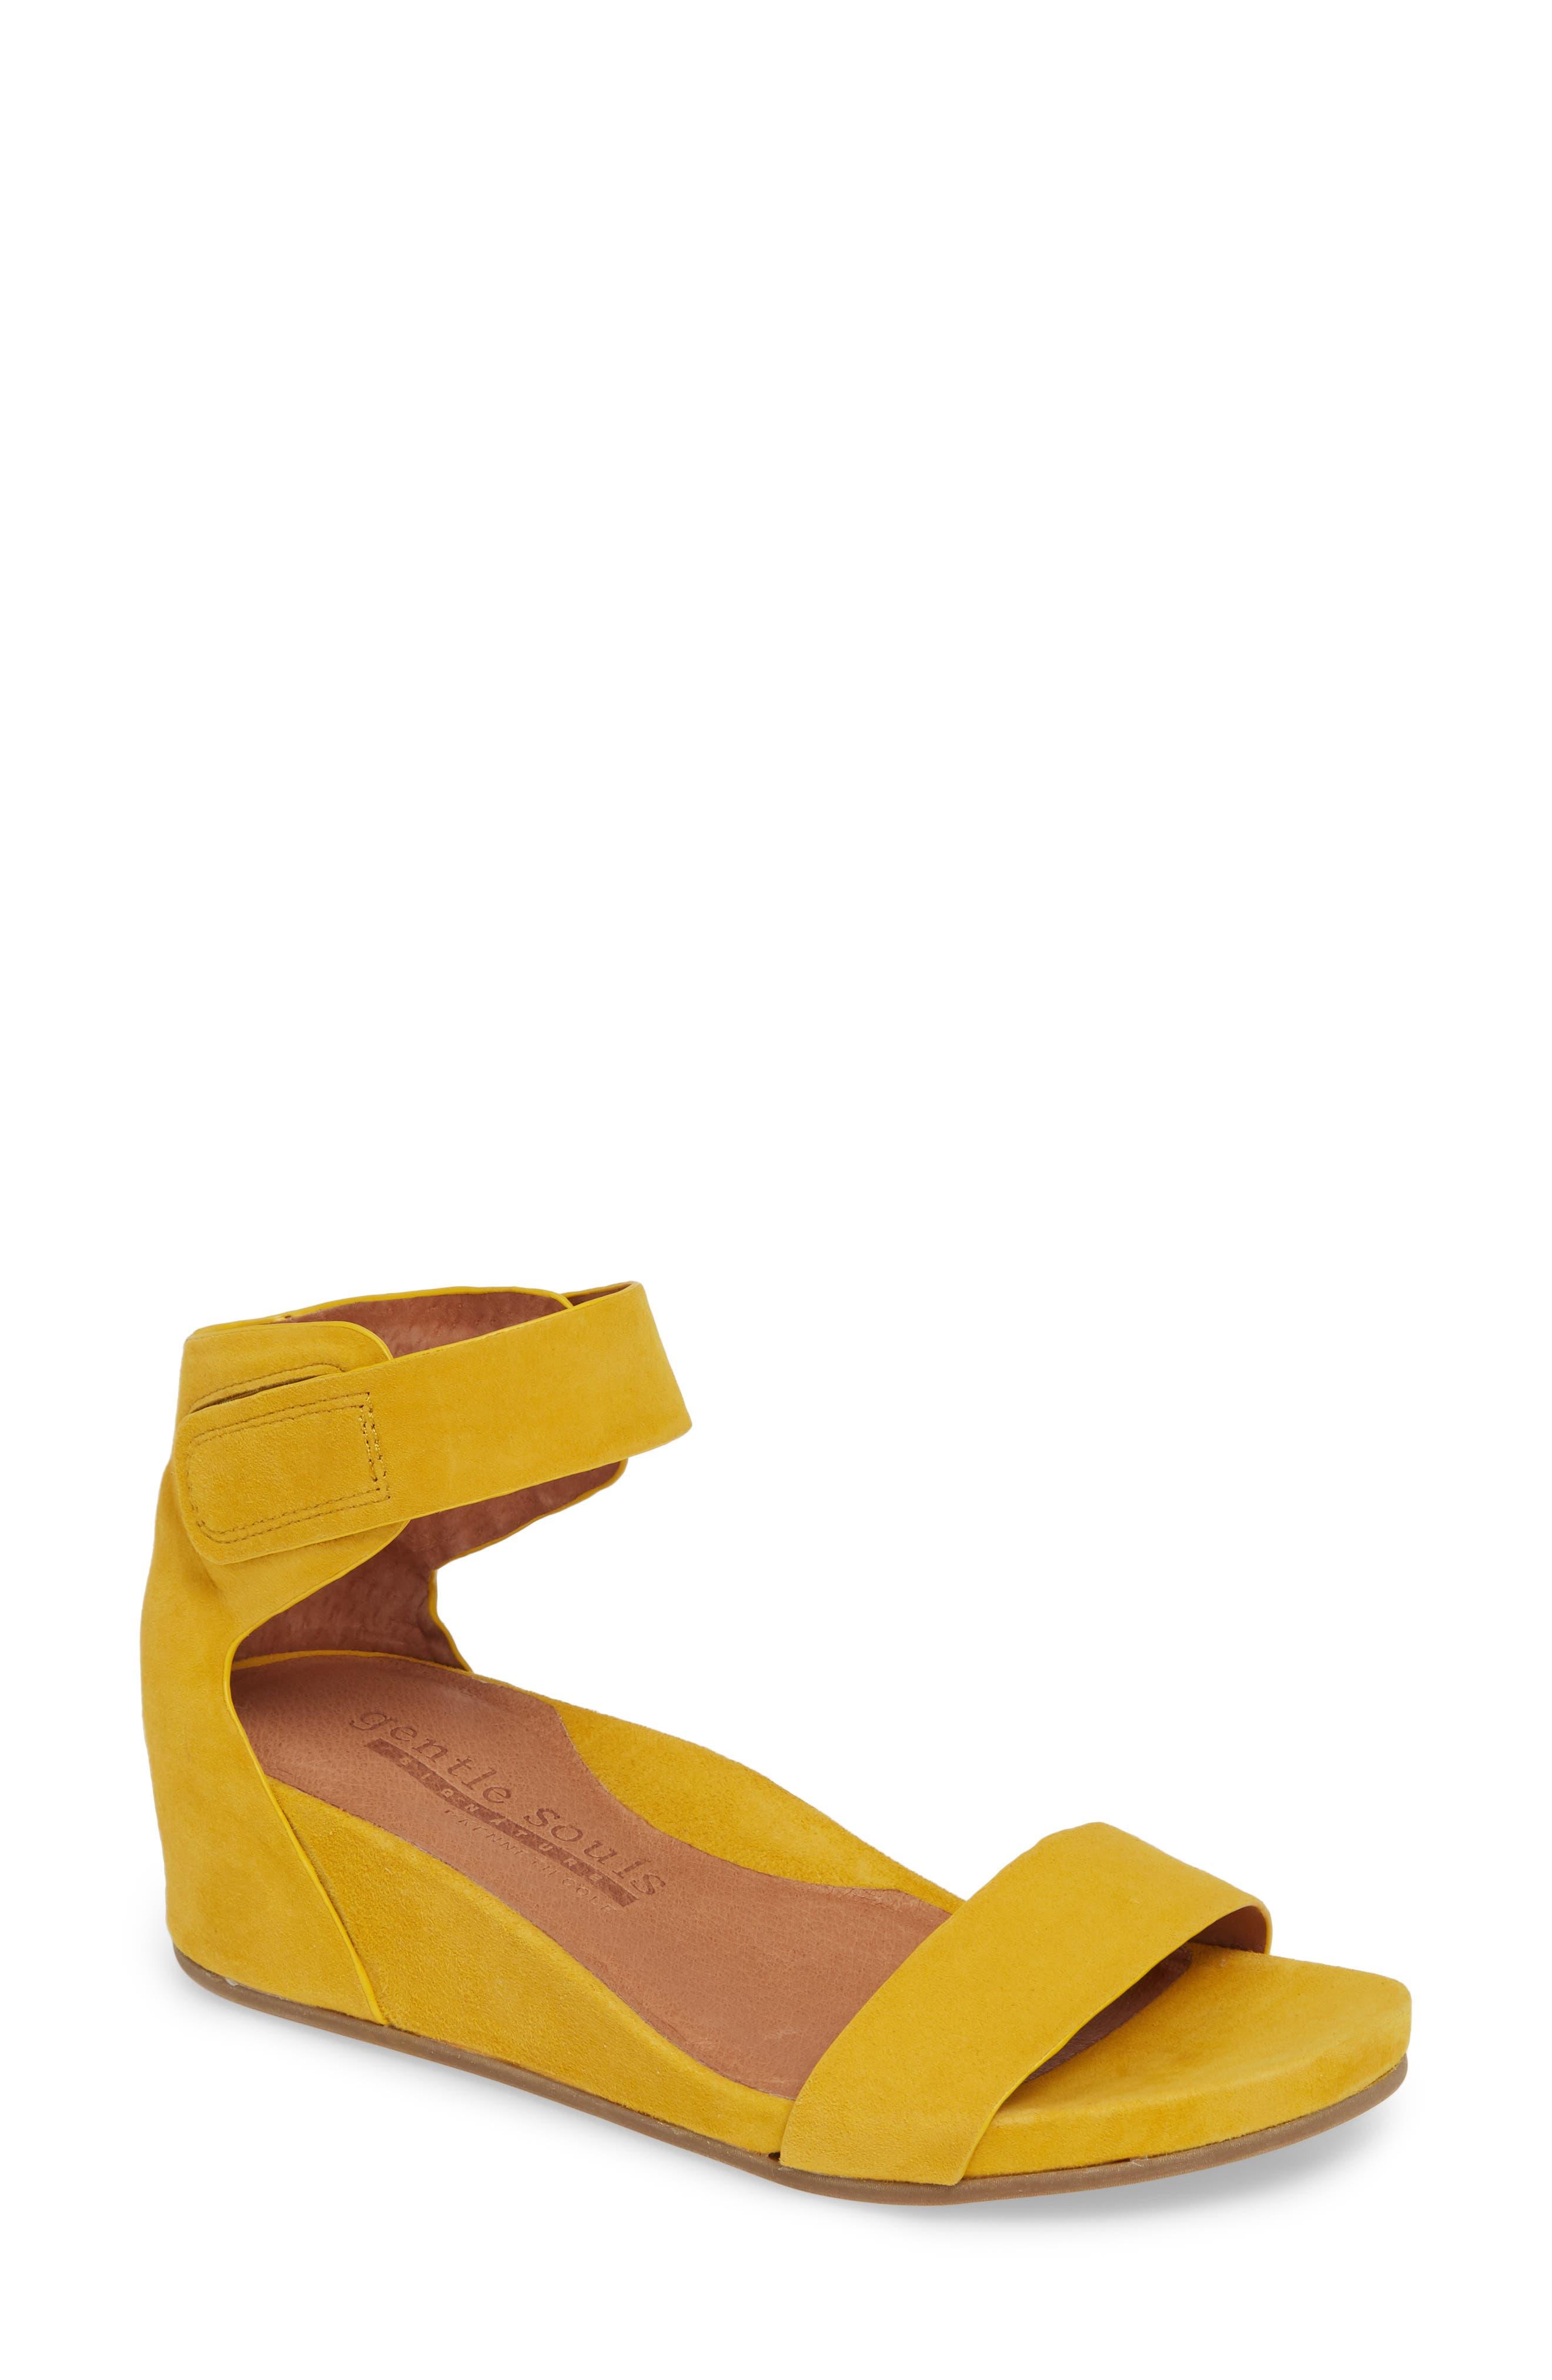 0af3dc6ac0bf Women s Gentle Souls Signature Sandals